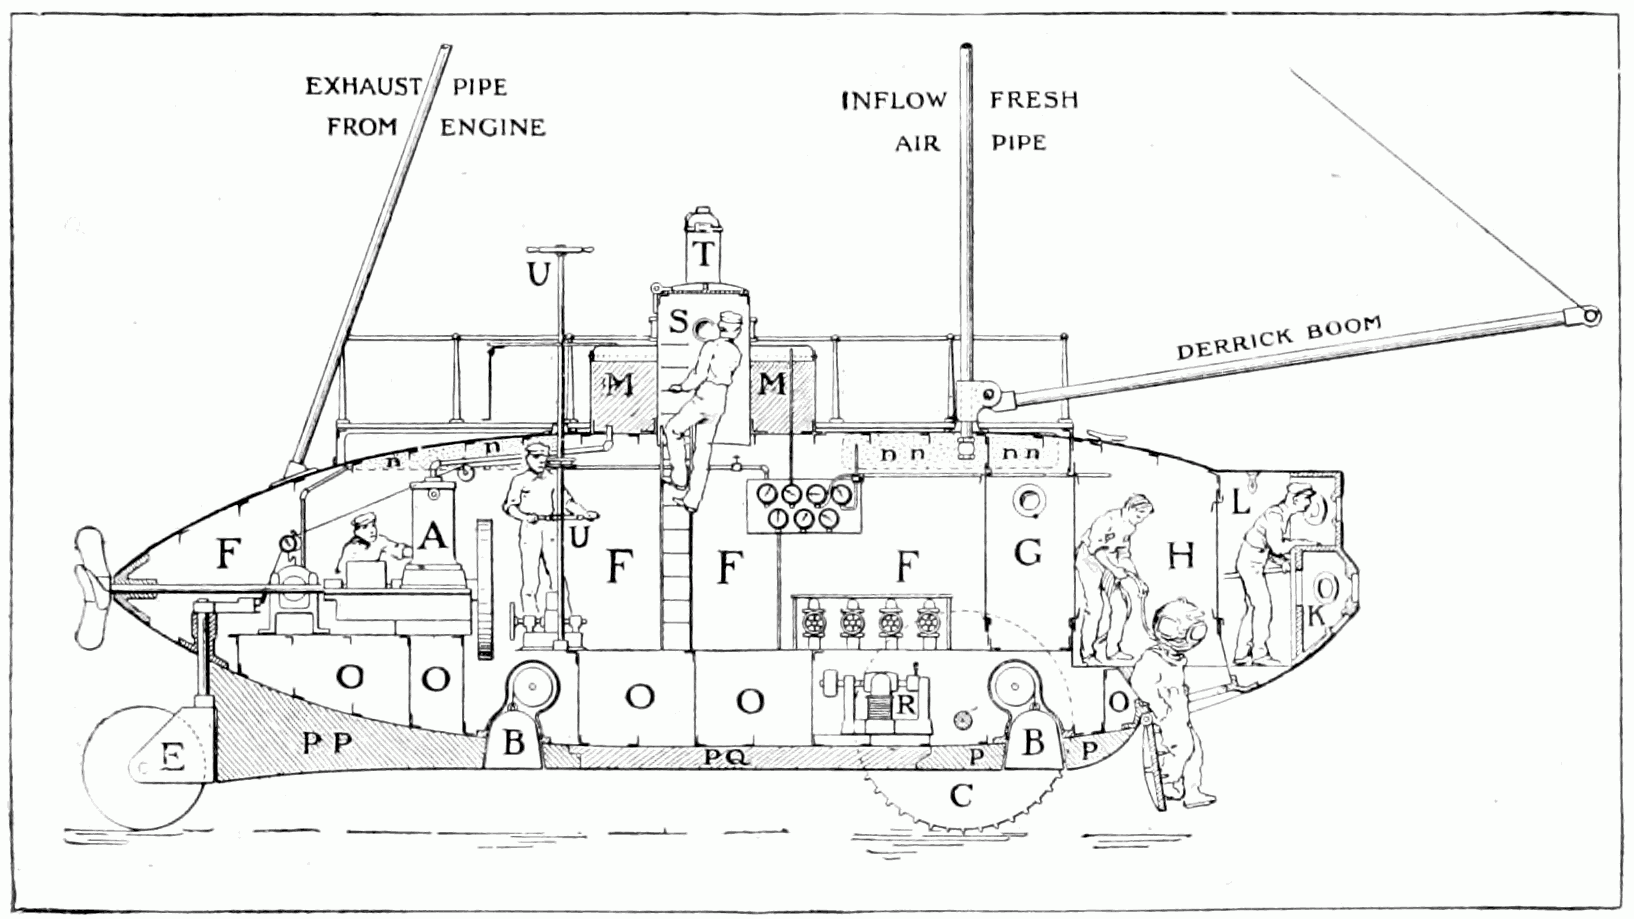 Plik Psm V58 D177 Longitudonal Section Of The Submarine